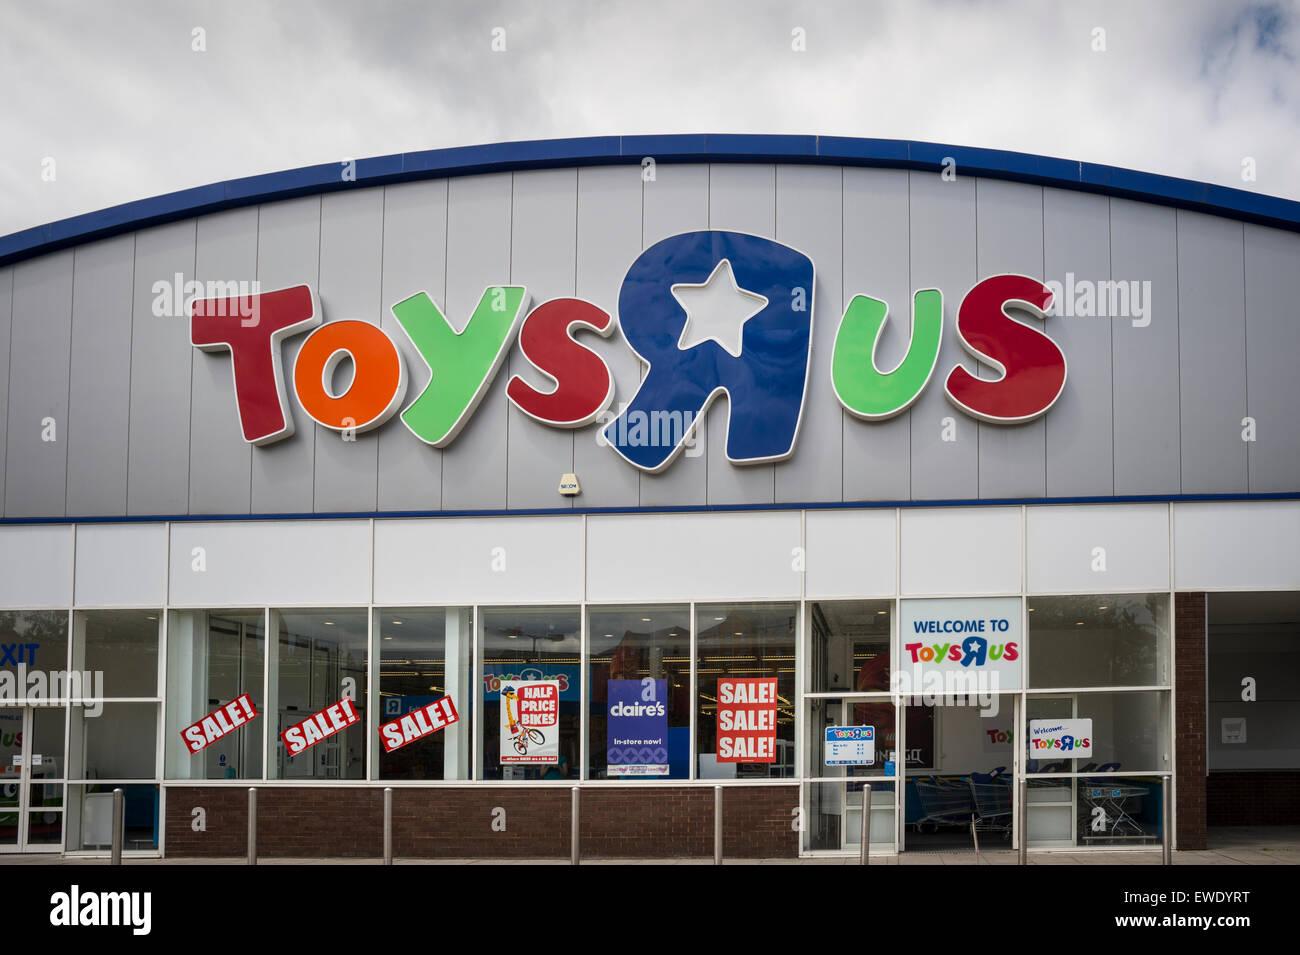 Toys R Us Store In Southampton Uk Stock Photo 84515084 Alamy